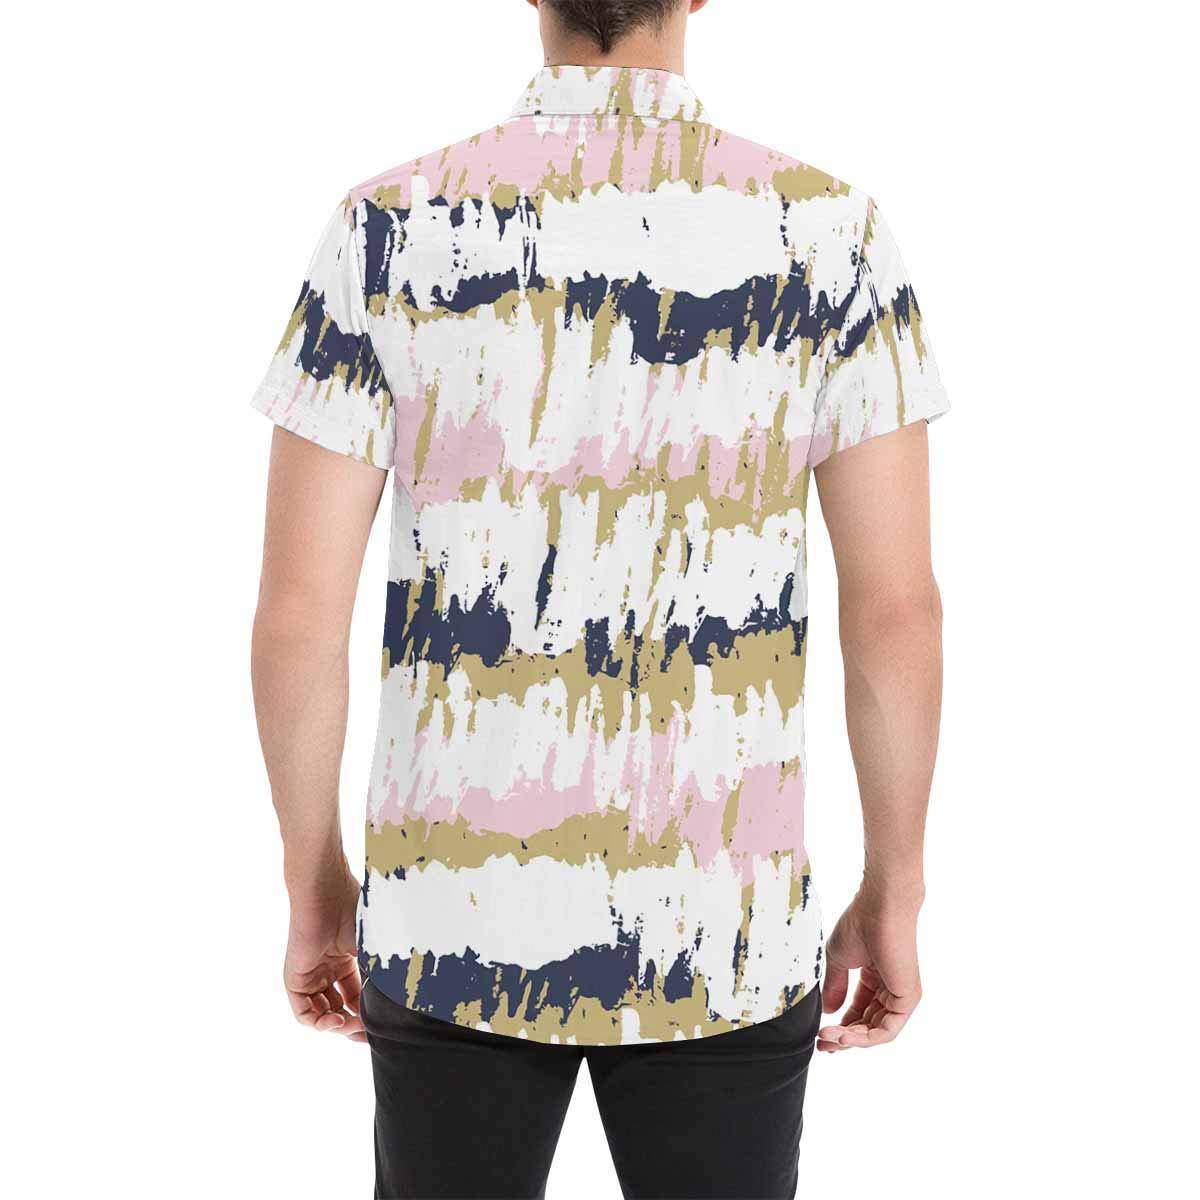 InterestPrint Colorful Striped Shirt Short Sleeve Print Button Down Shirt for Men